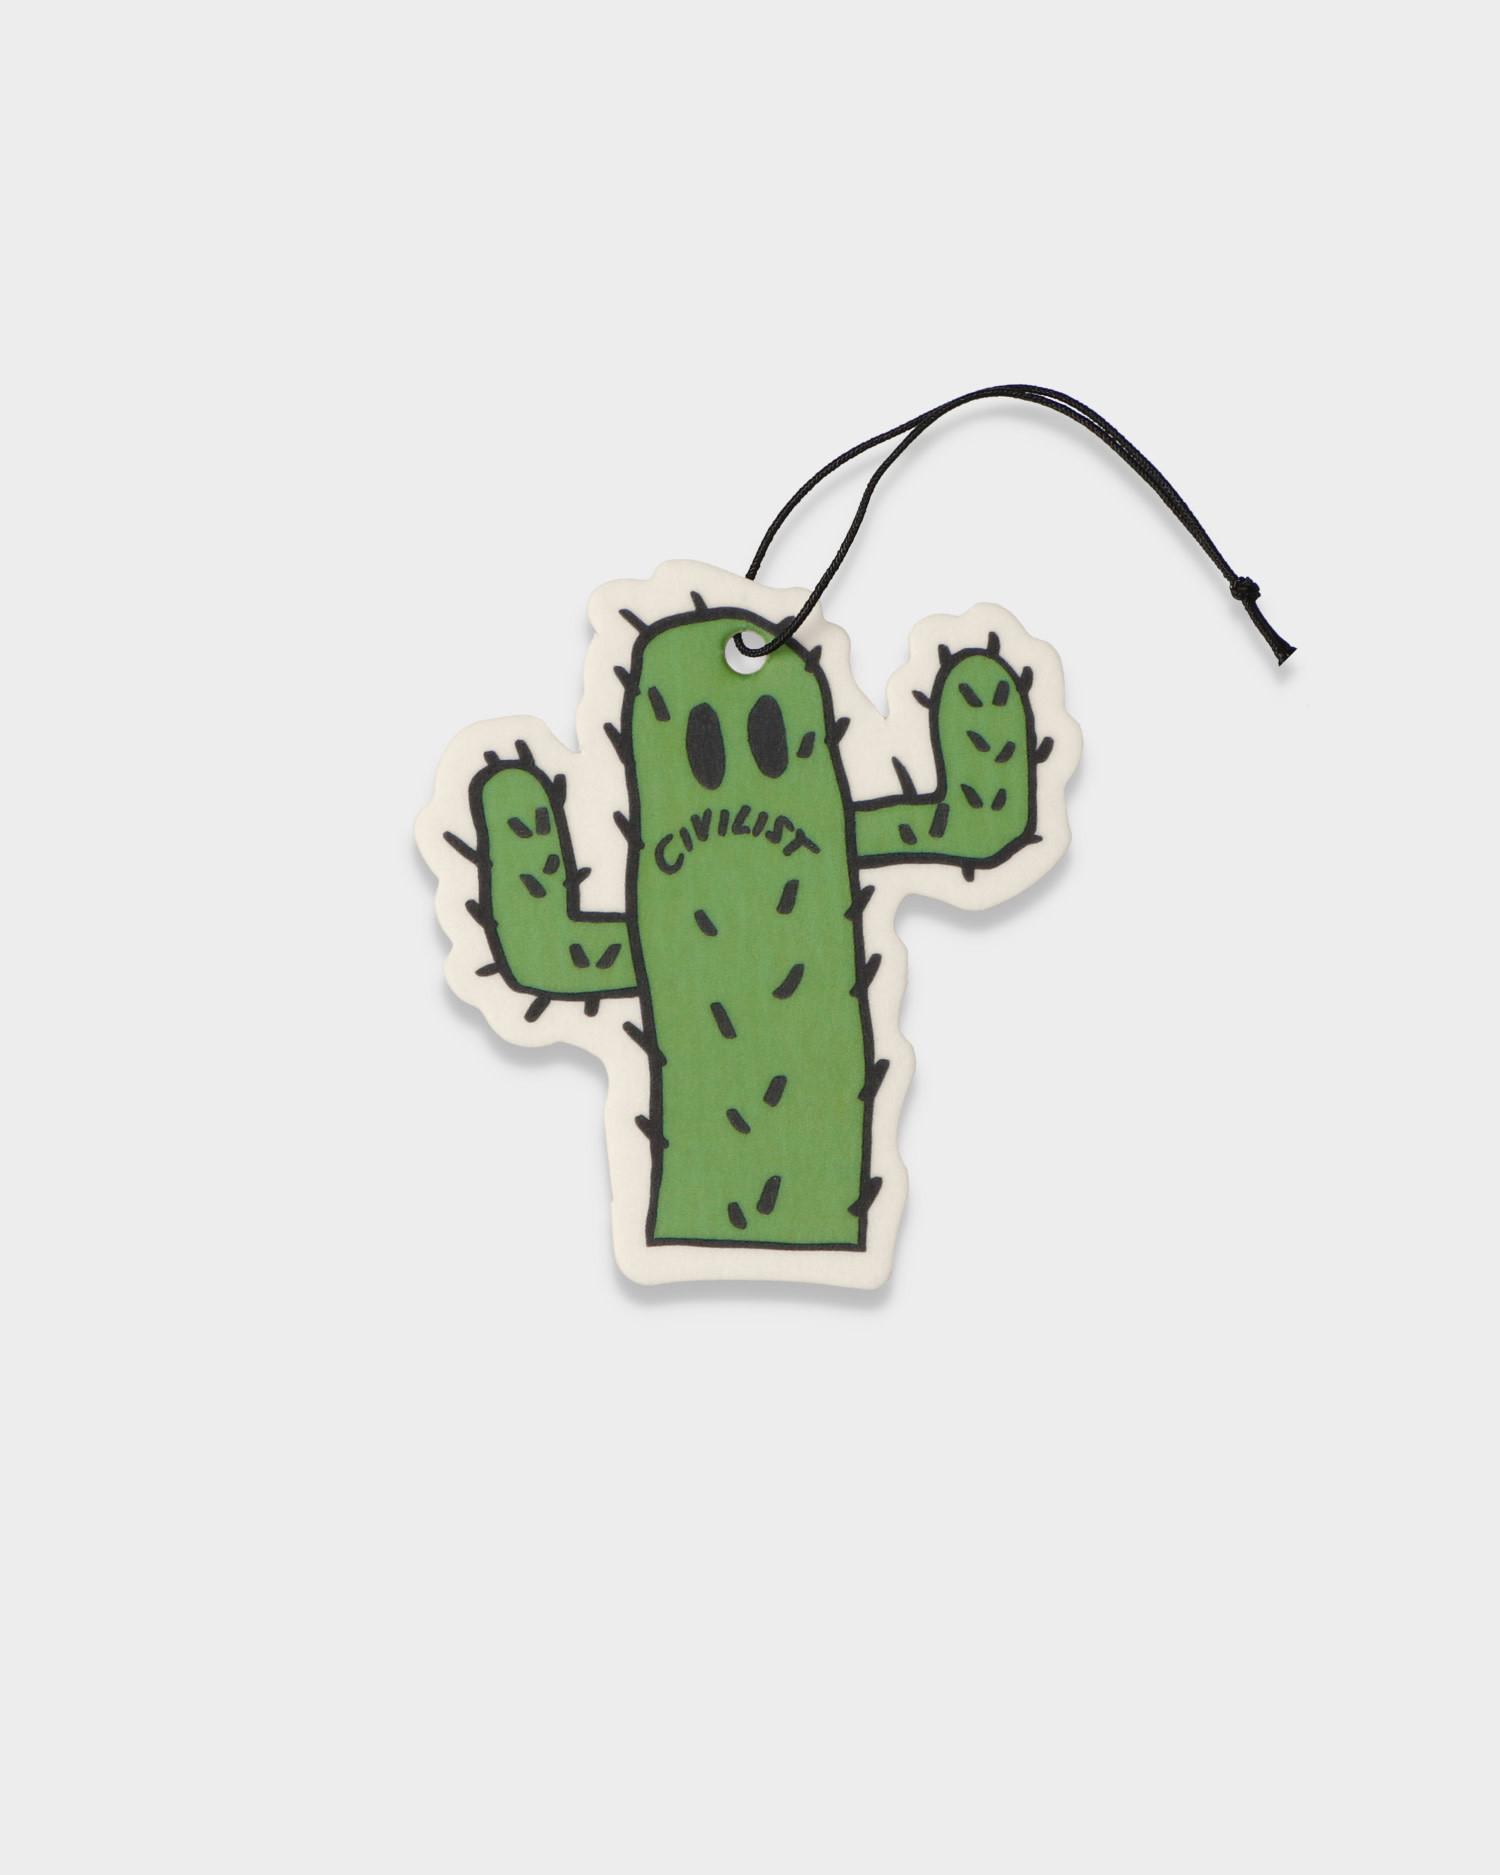 Civilist Cactus Smiler Air Freshener Green